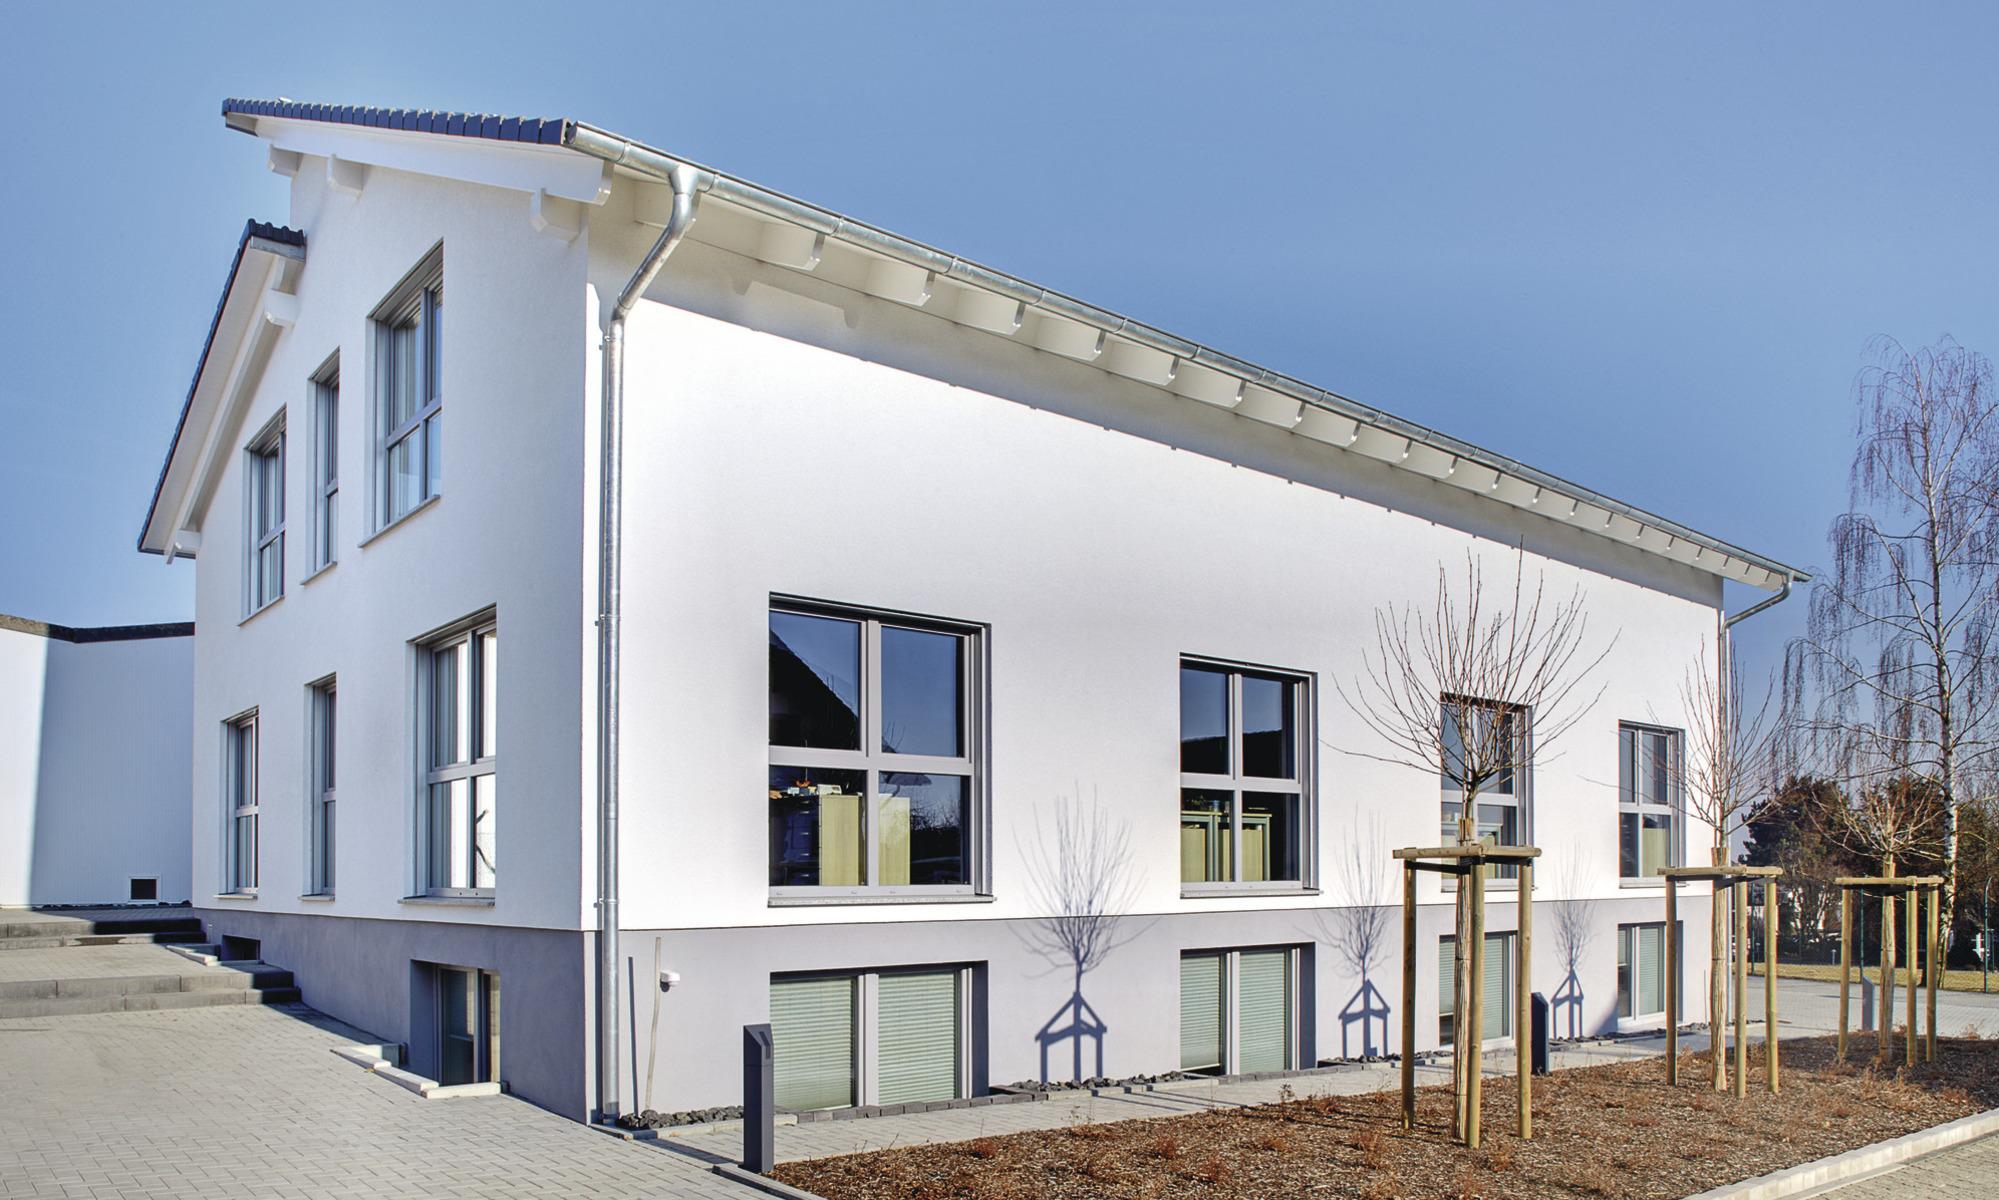 Bürogebäude  Firma Ottomar Heep GbR Im Bruch 26 DE 56414 Hundsangen Projektnr. 47524